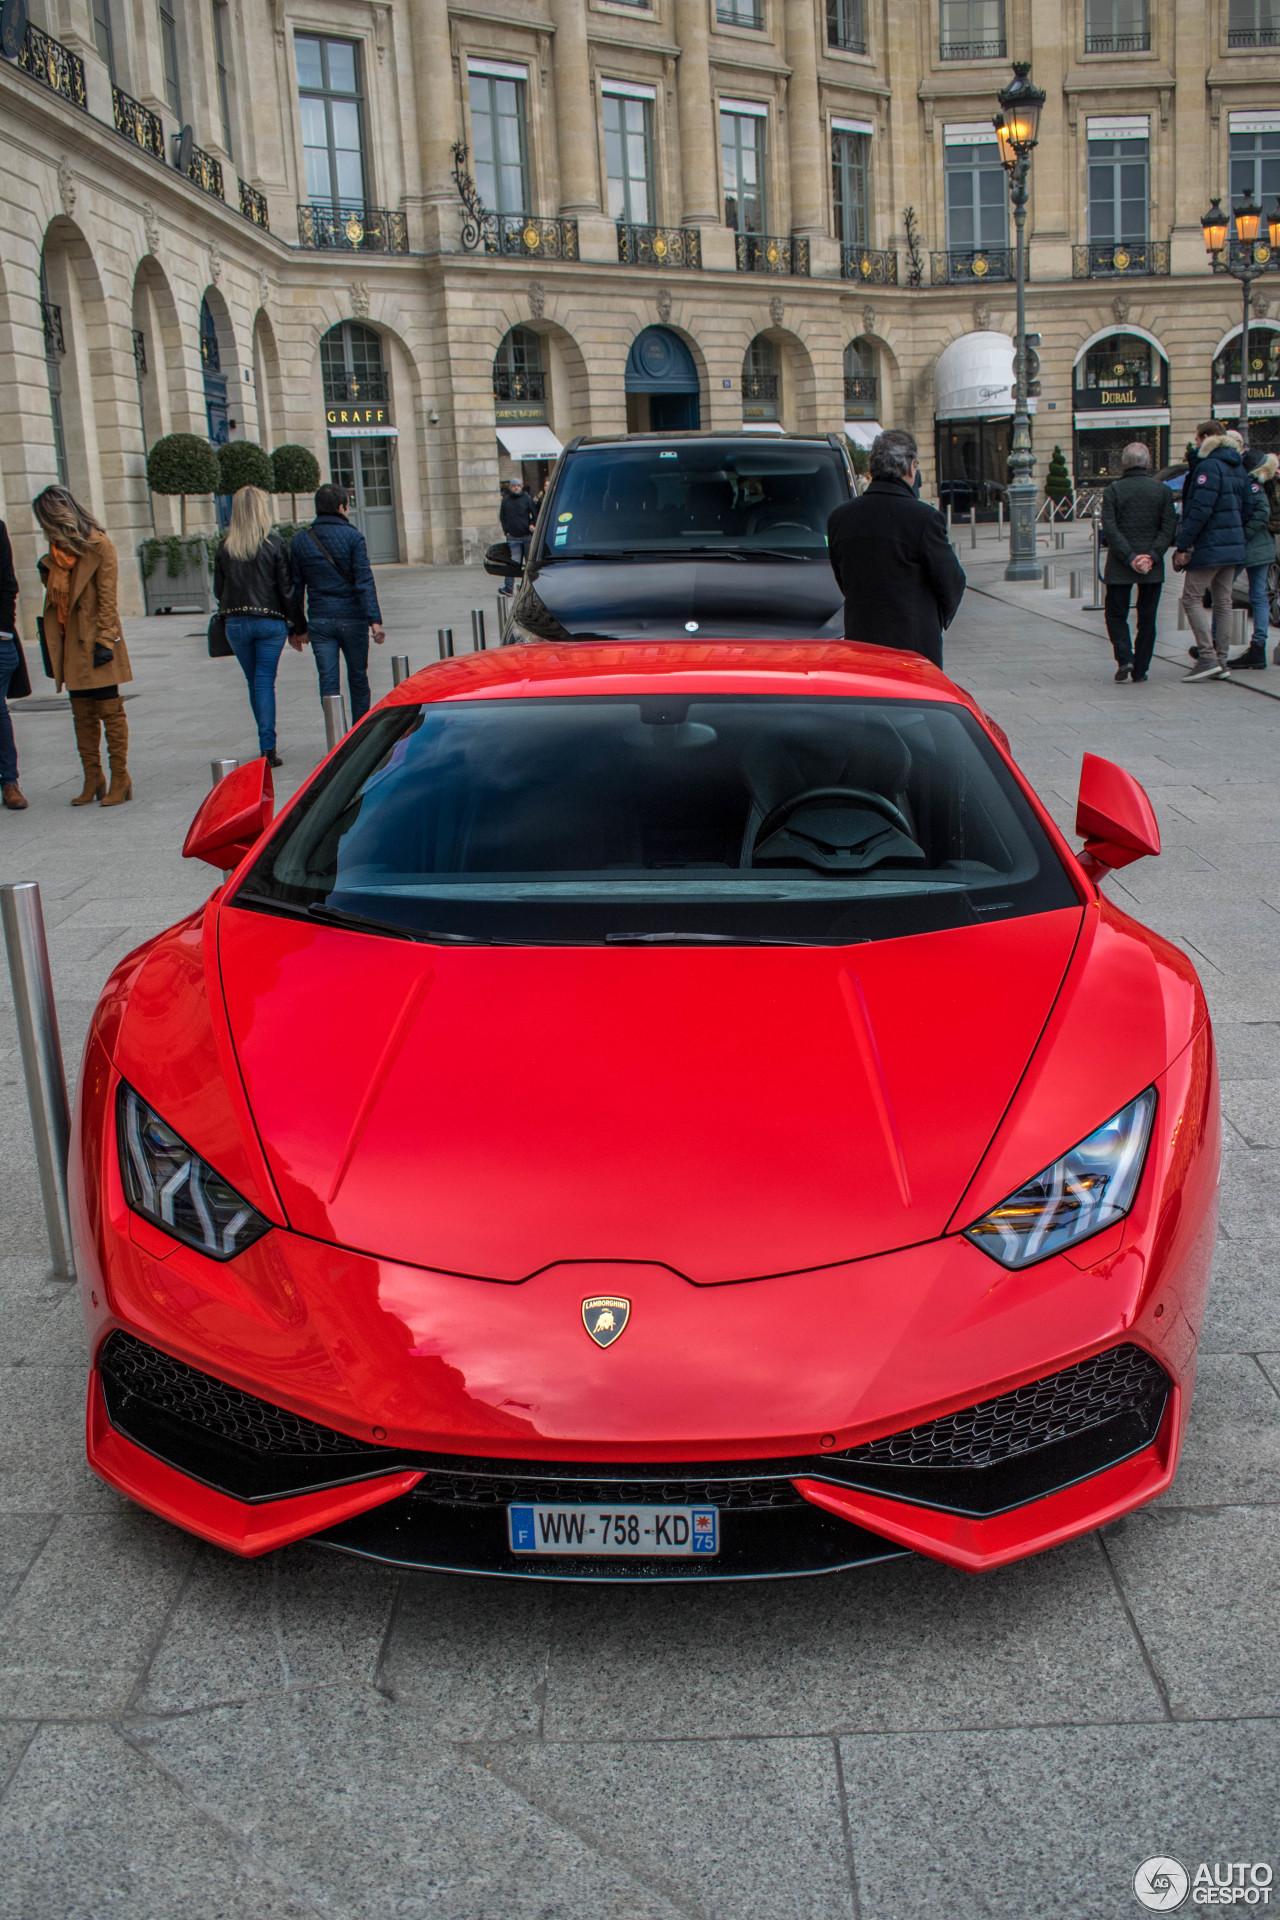 lamborghini-huracan-lp610-4-c481519022017194508_7 Mesmerizing Lamborghini Huracan Price In south Africa Cars Trend